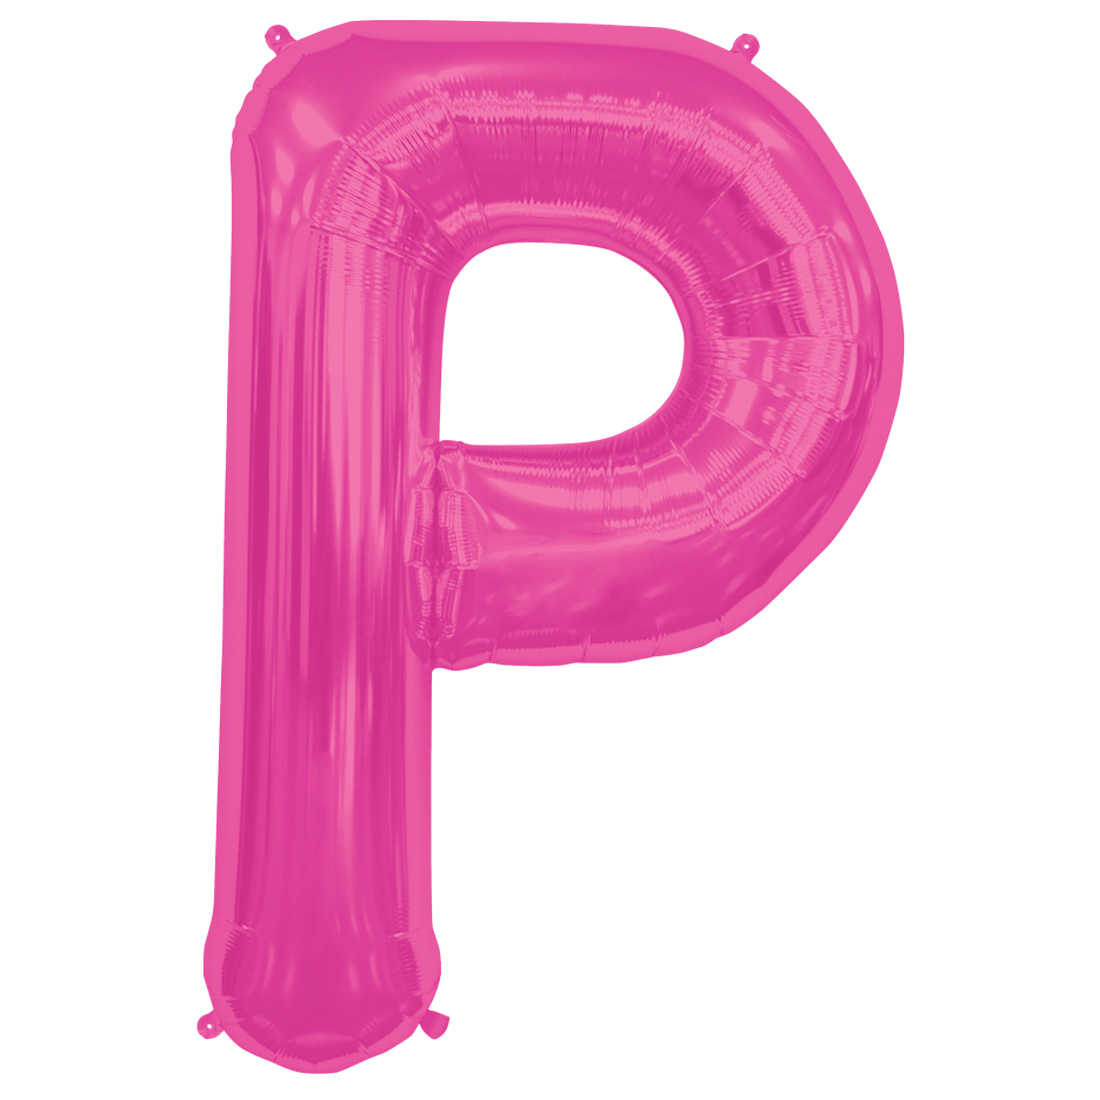 "Northstar Alphabet Letter P Shape Solid Jumbo Helium 34"" Foil Balloon, Magenta"